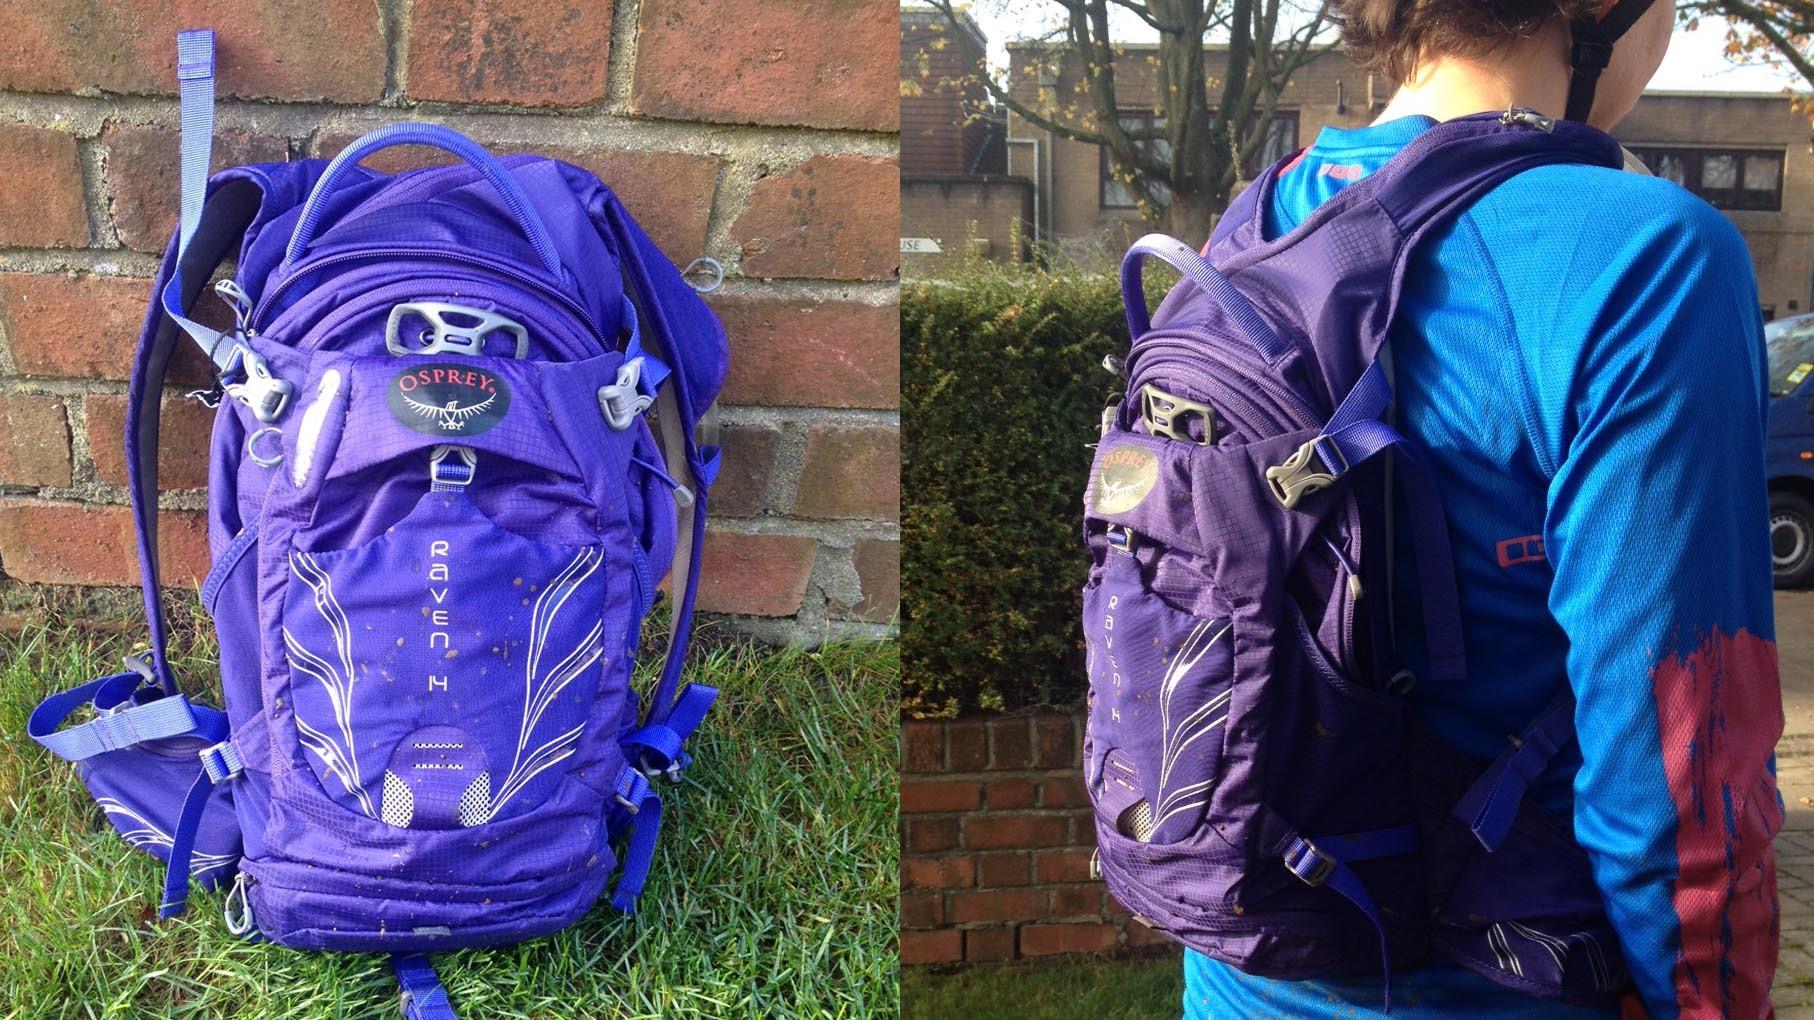 The Osprey Raven 14 women's mountain bike rucksack has pockets galore